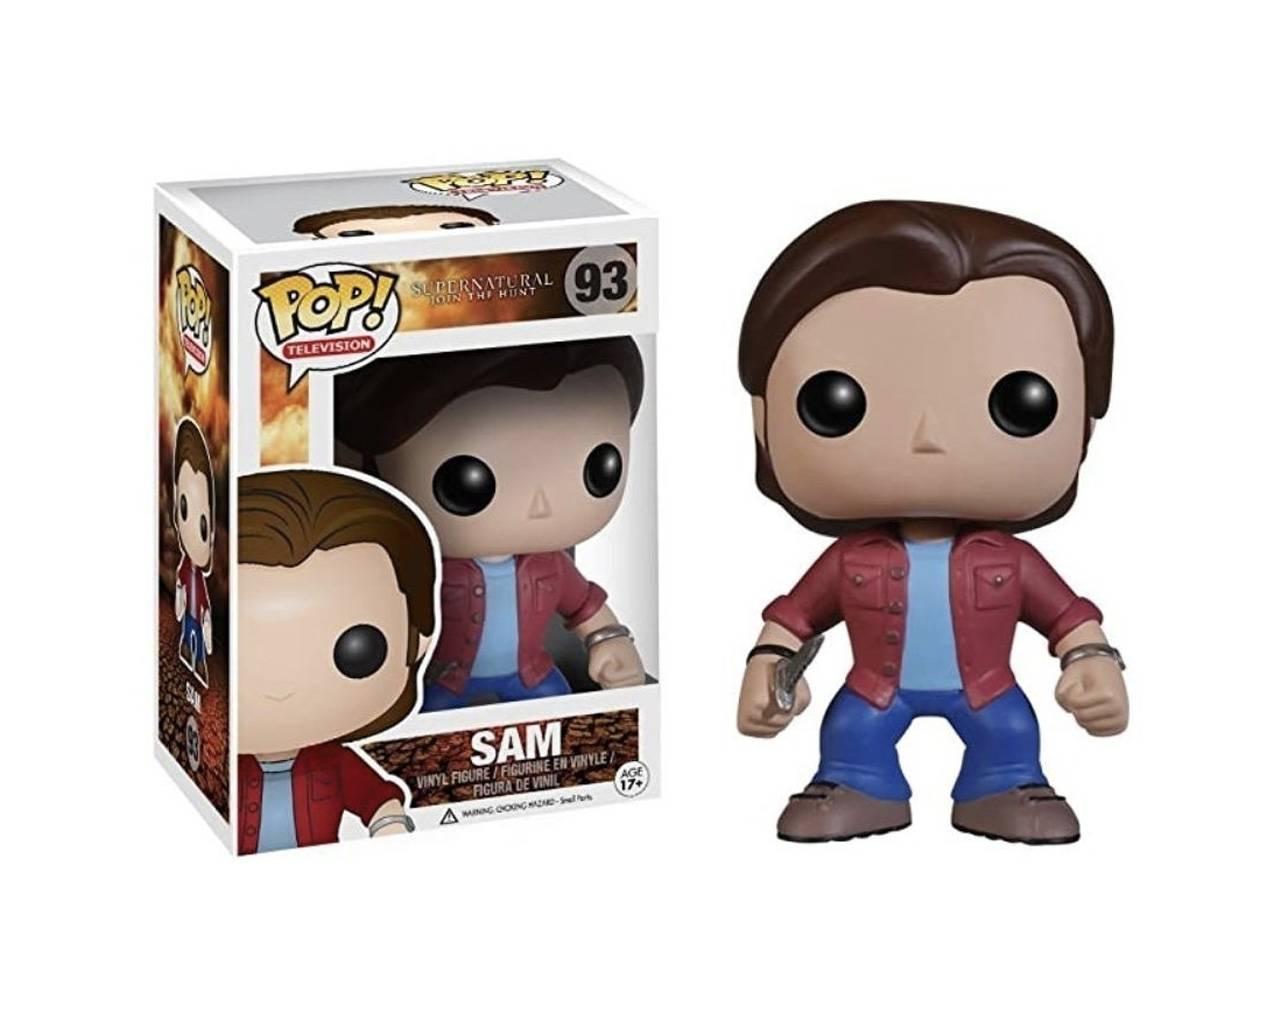 Sam (Supernatural) Pop! Vinyl